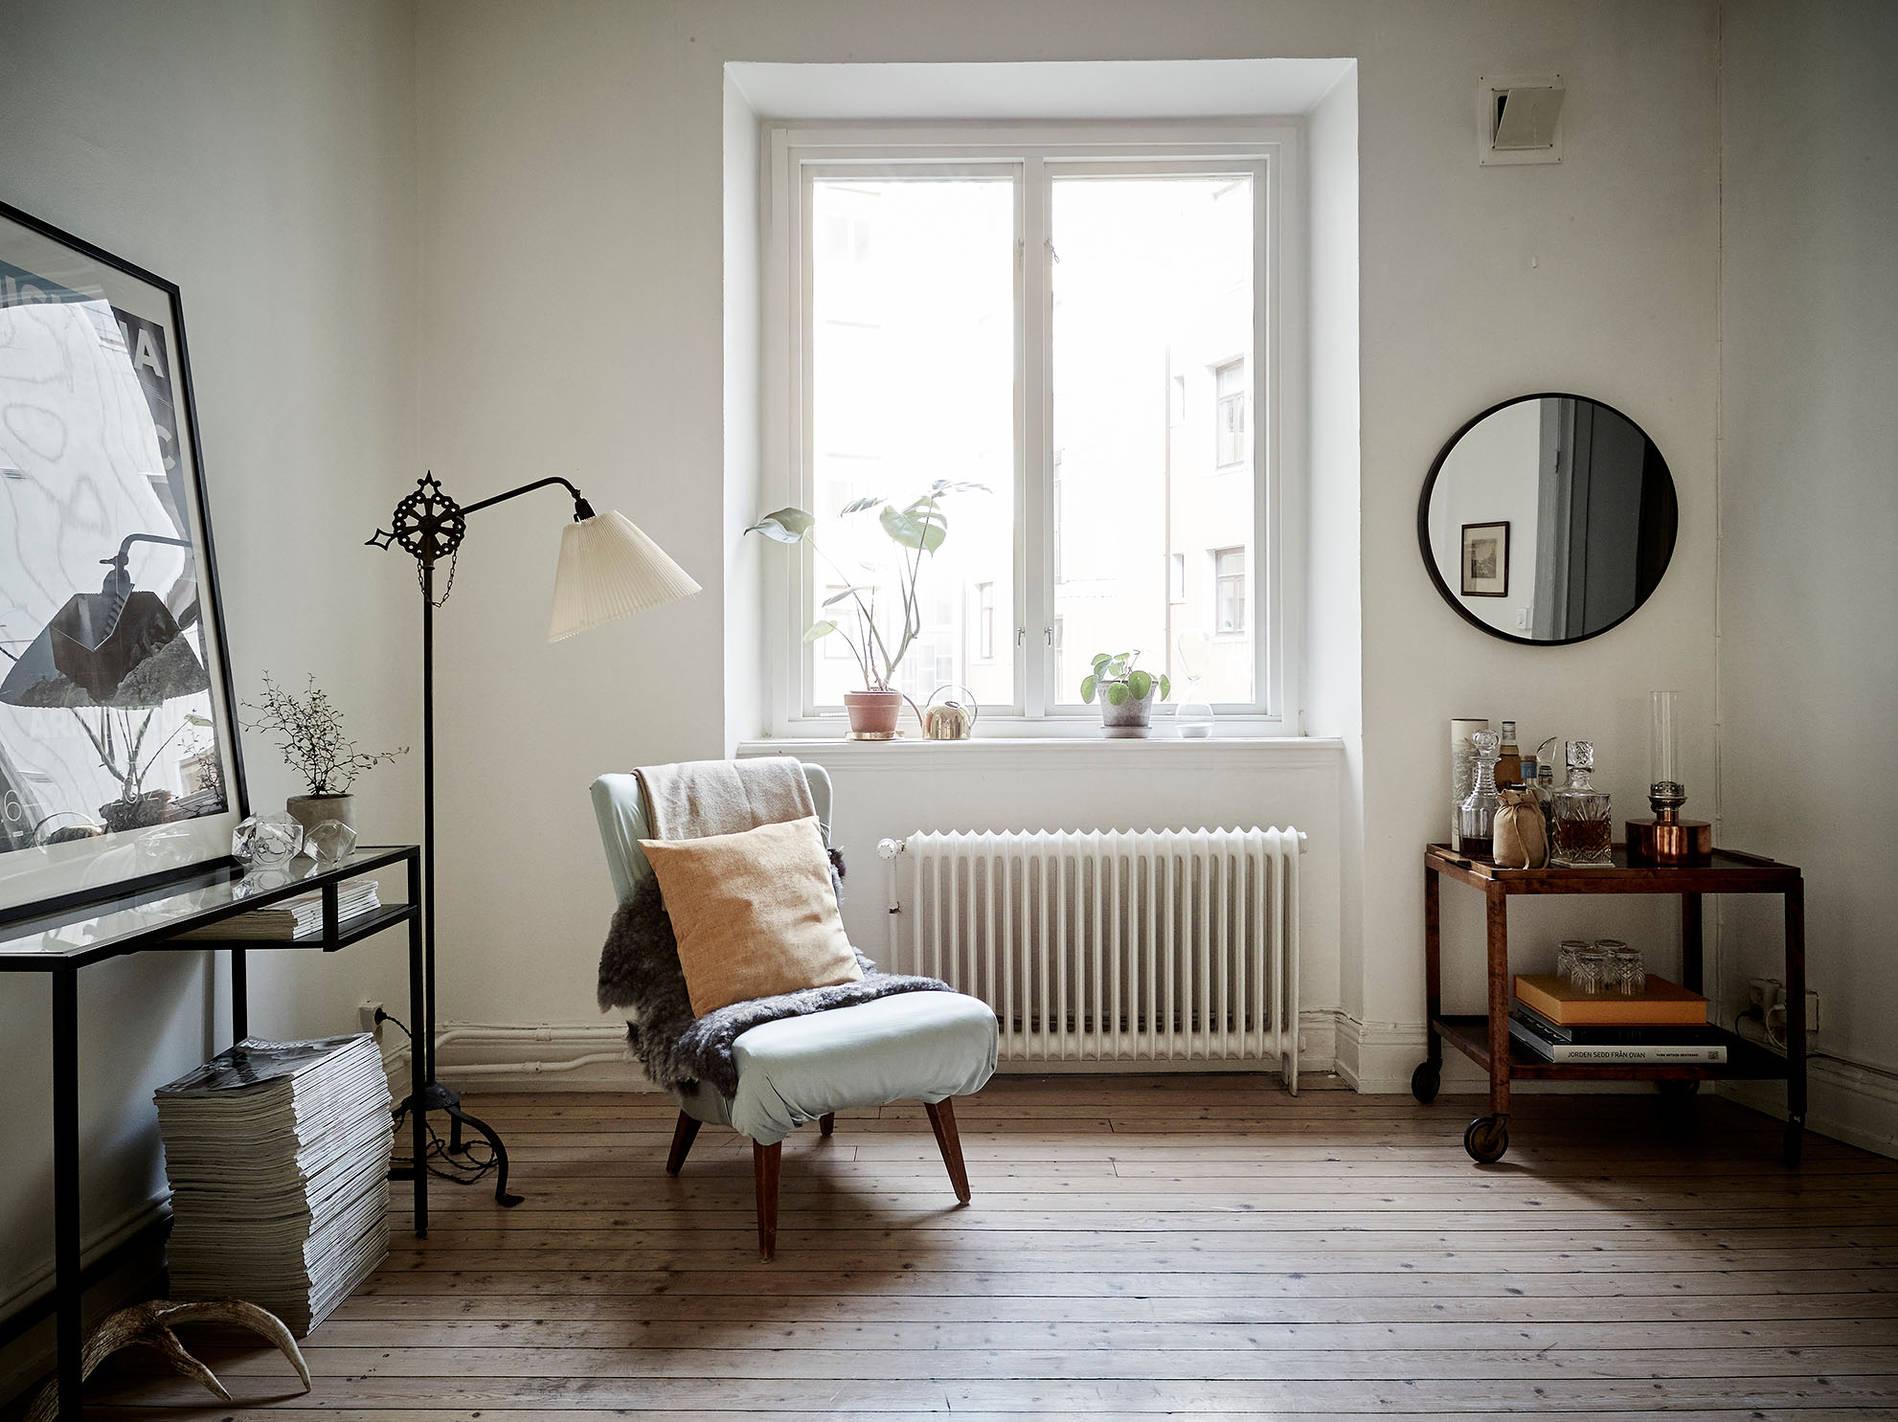 Appartement Nordhemsgatan 31 B_1 en vente sur Stadshem